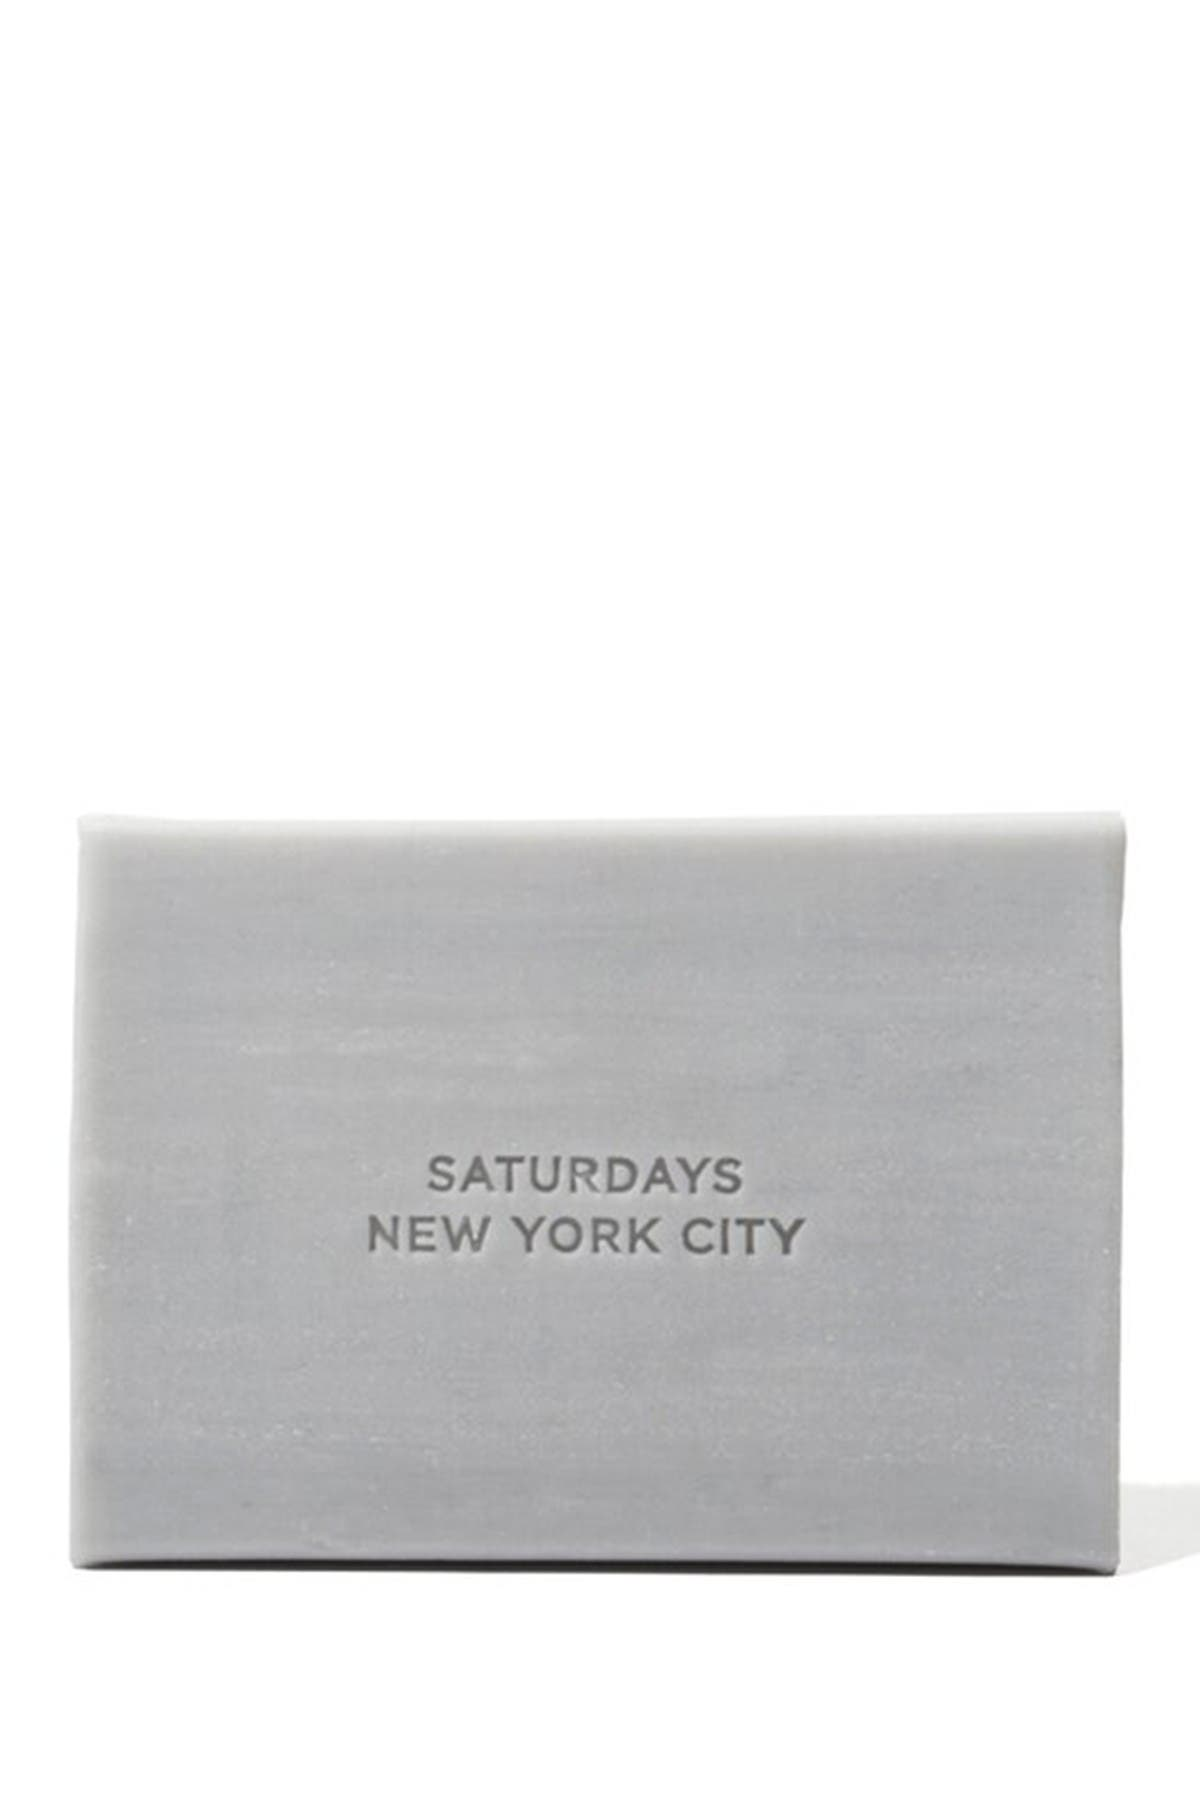 Image of SATURDAYS NYC Moisturizing Bar Soap